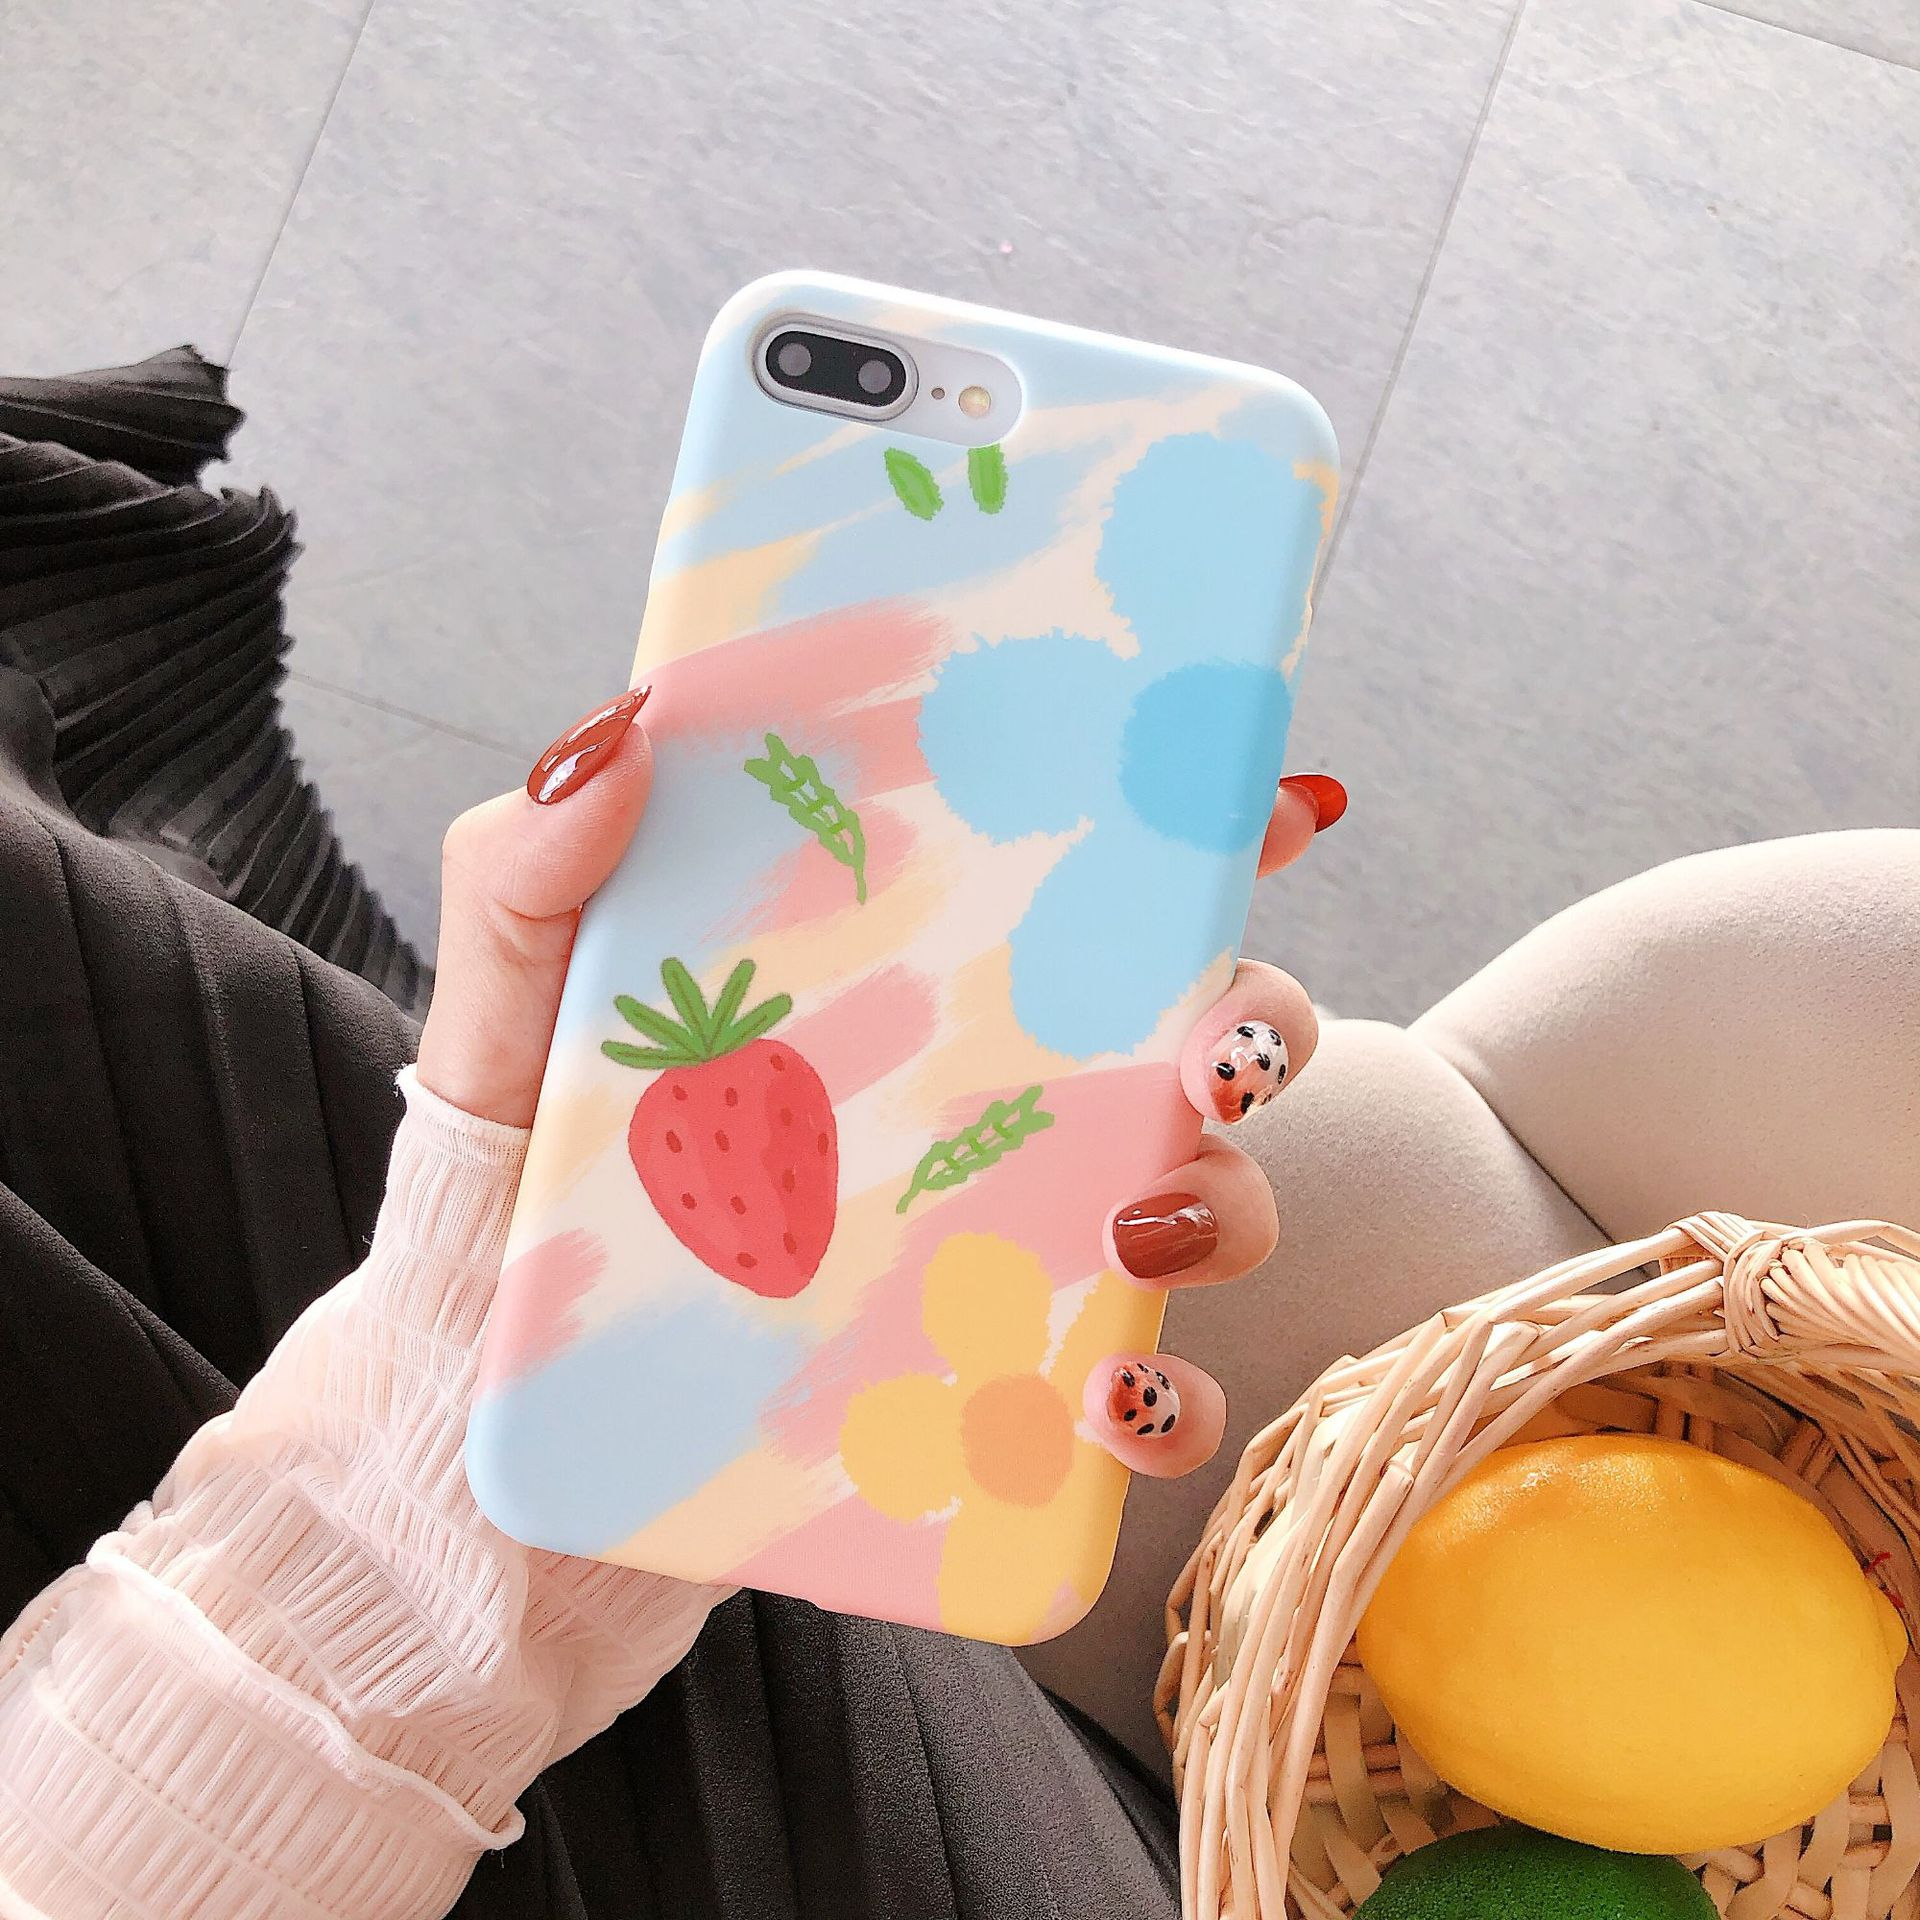 Estilo coreano bonito morango para o caso 11 pro max xr iphone 7 6s caso macio feminino para iphone 8 plus 11 caso 6.1 polegada floral